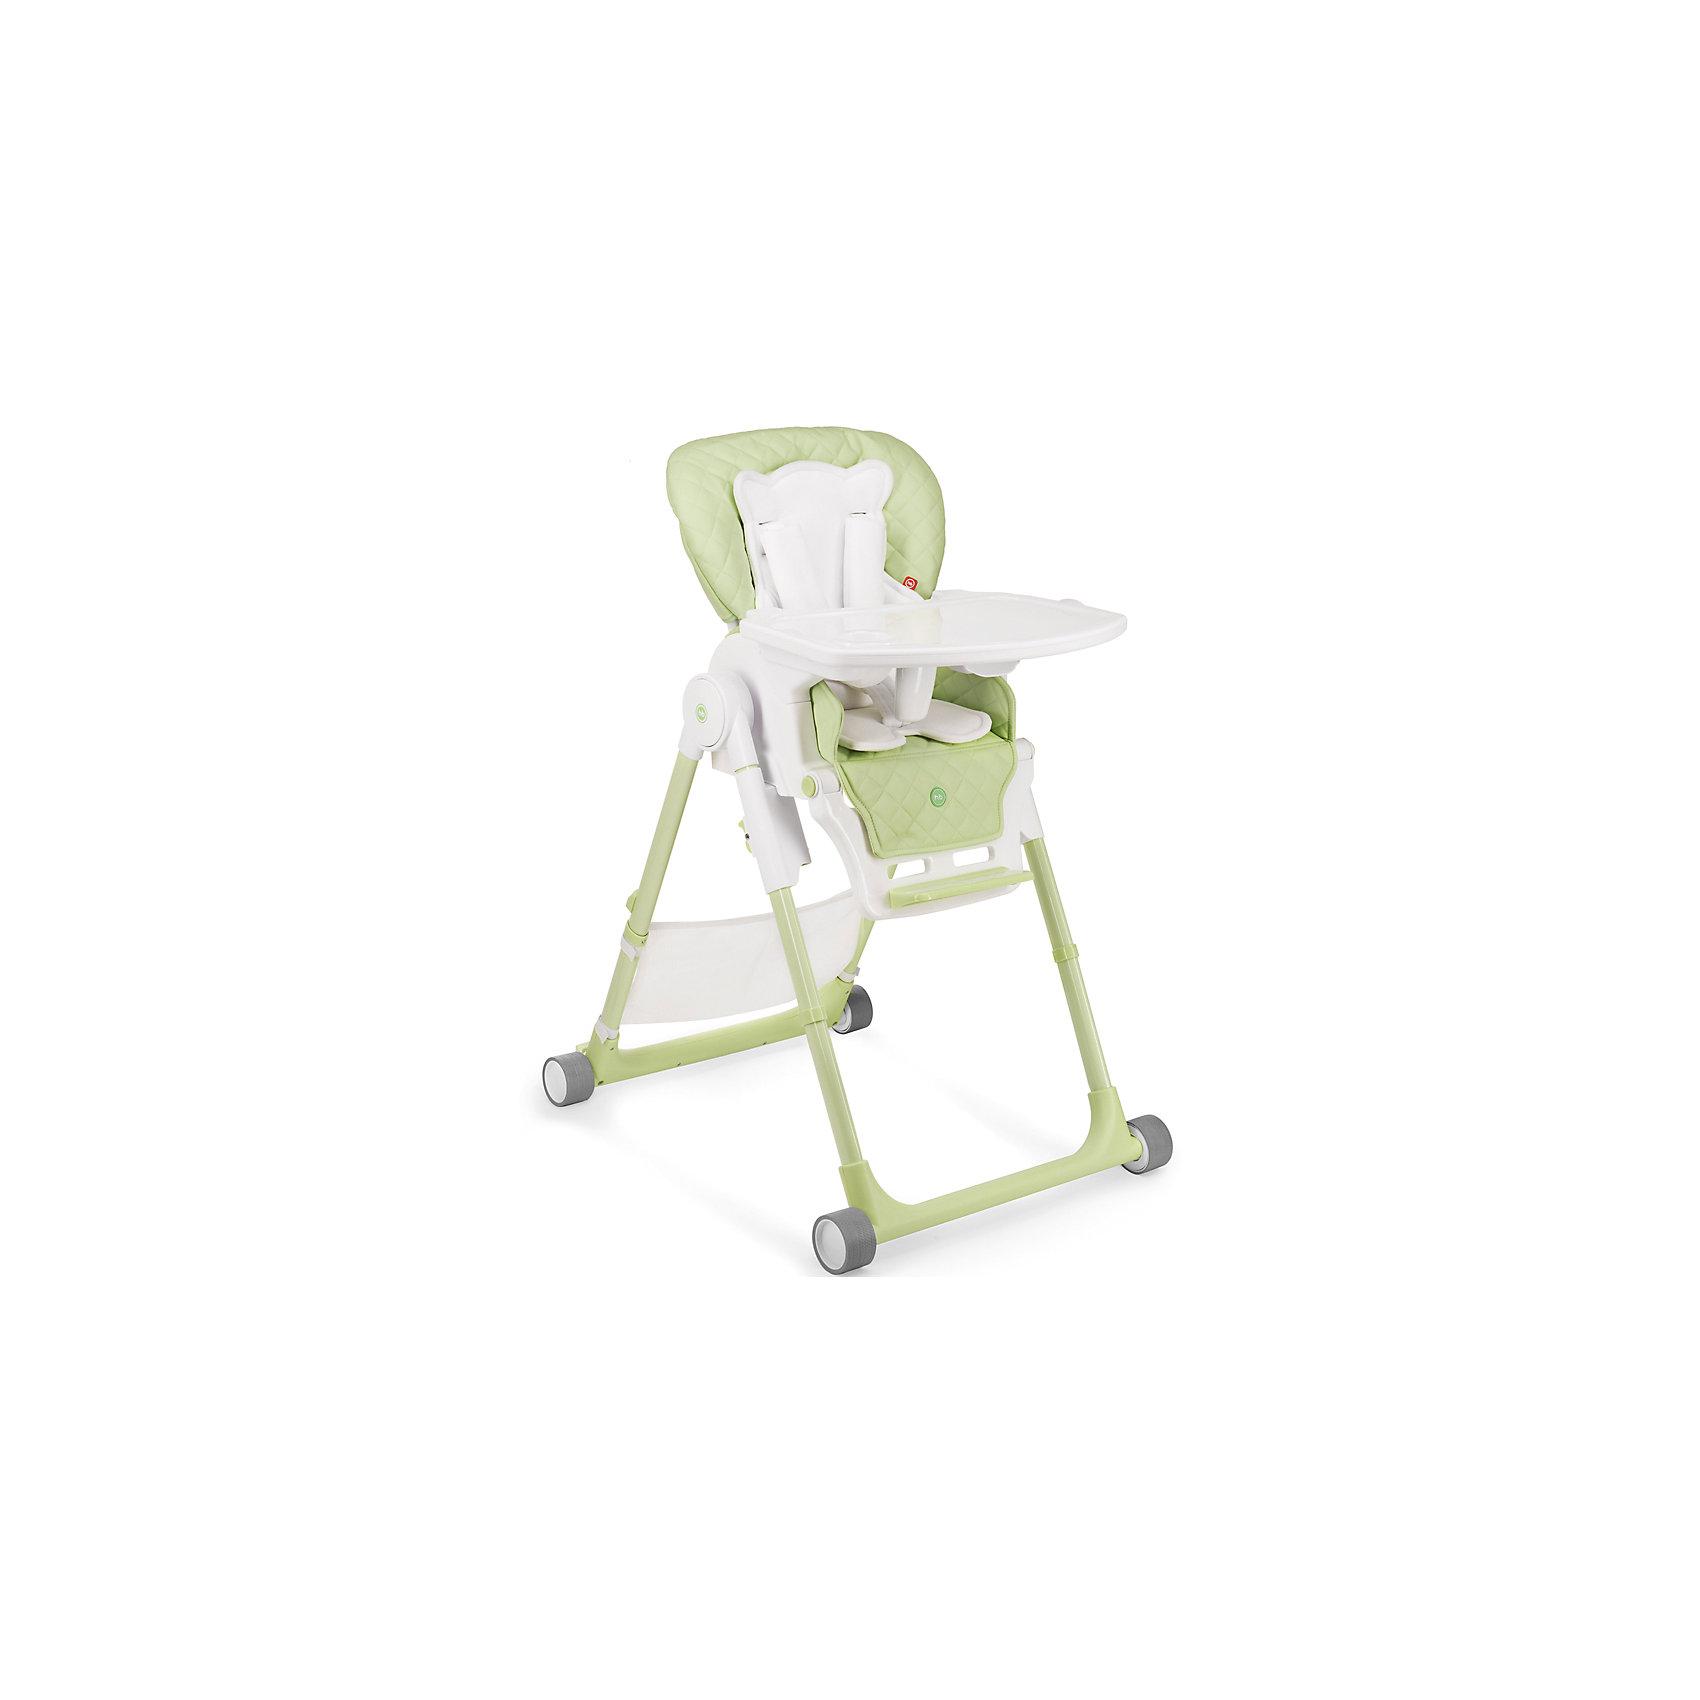 Happy Baby Стульчик для кормления Wiliam V2, Happy Baby, зеленый happy baby ходунки smiley v2 цвет голубой